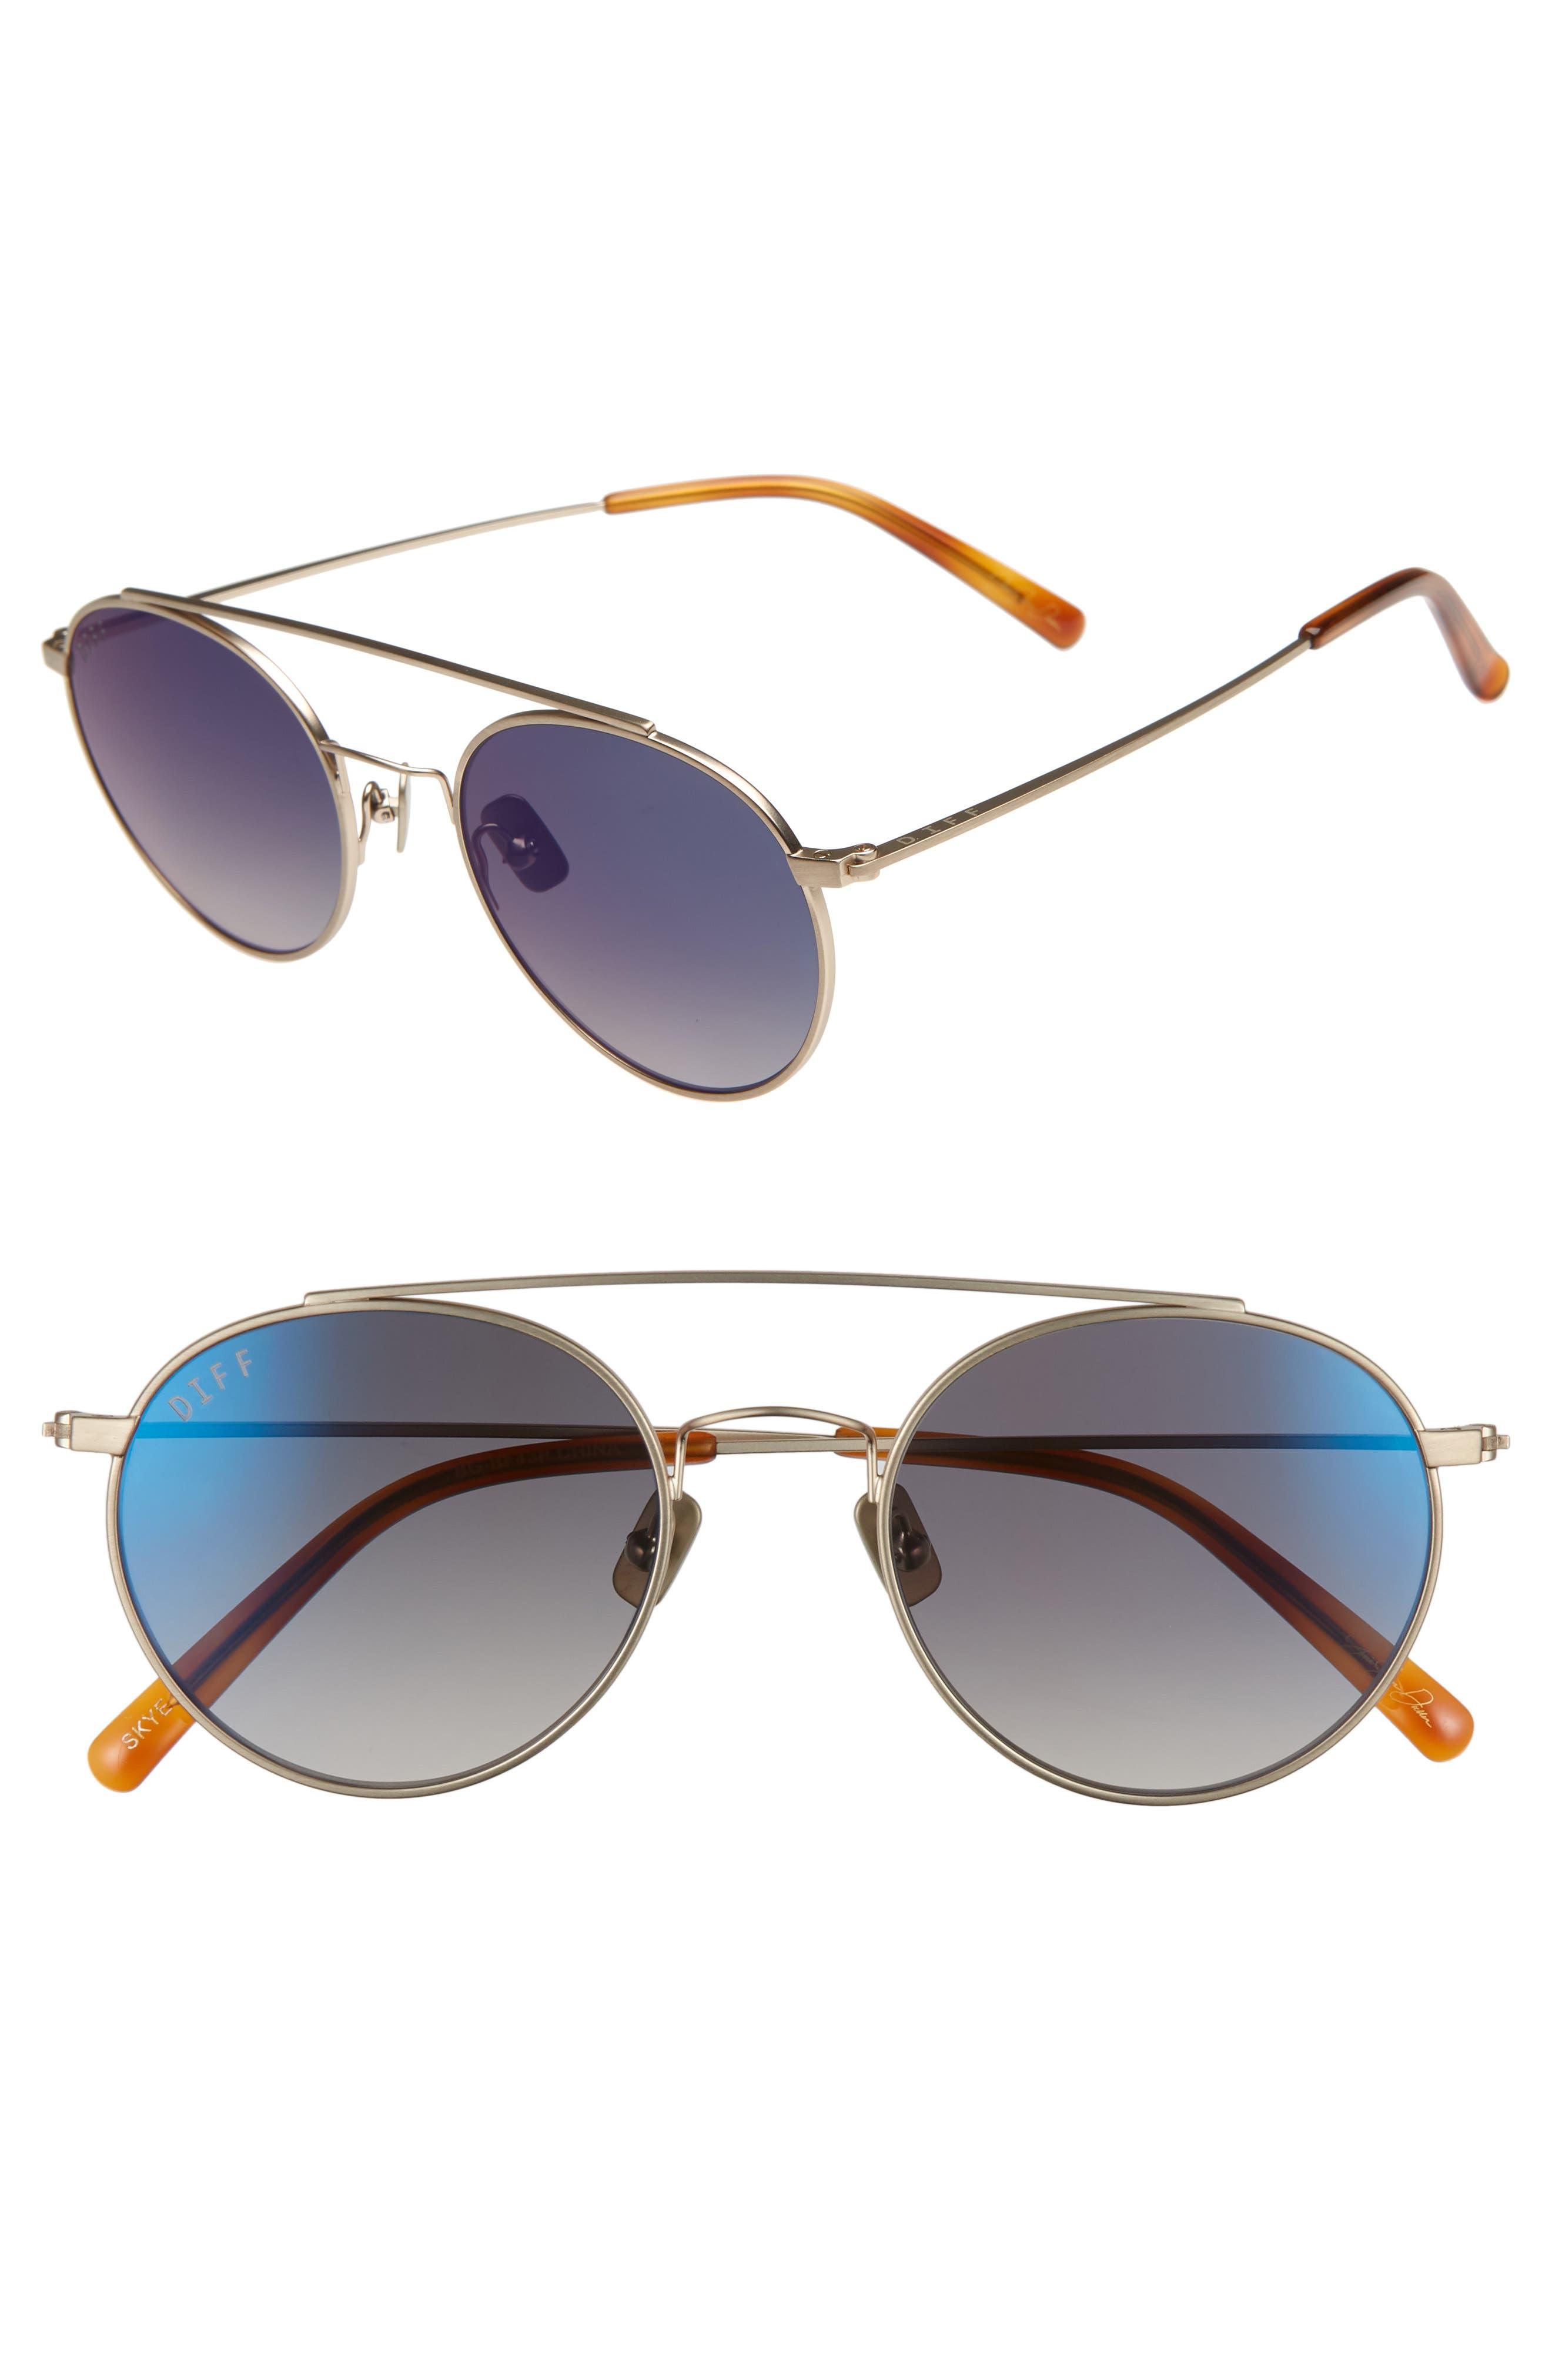 Skye 51mm Aviator Sunglasses,                             Main thumbnail 1, color,                             BRUSHED GOLD/ BLUE